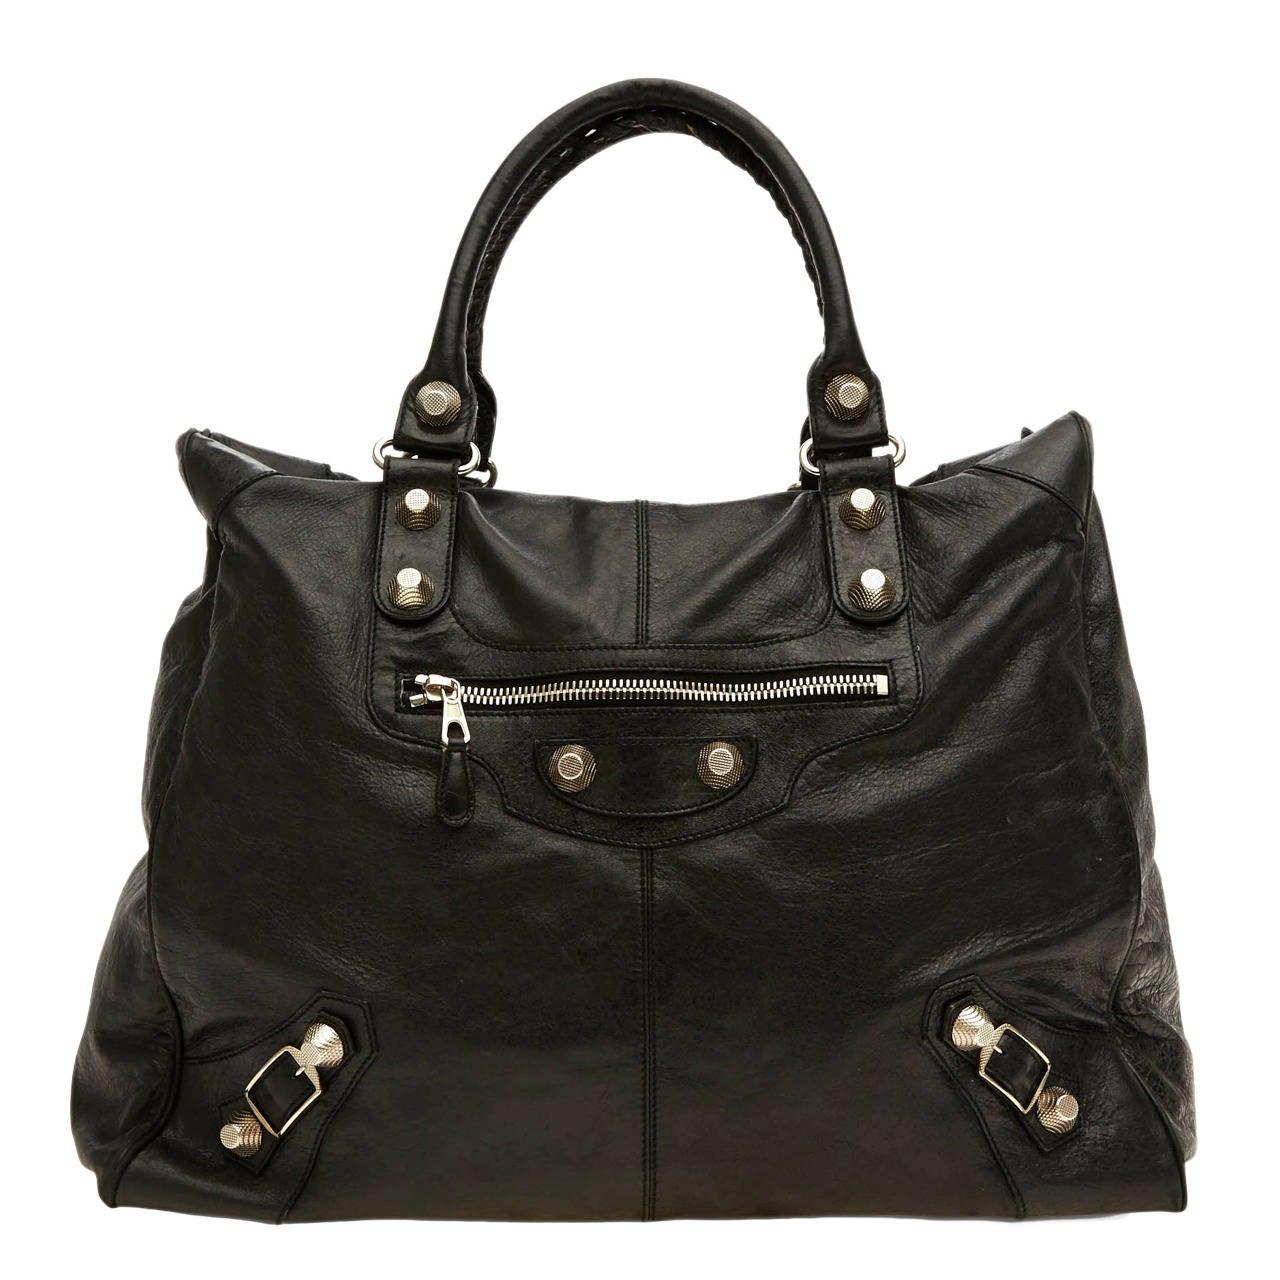 Balenciaga Weekender Giant Studs Handbag Leather sNk95xW